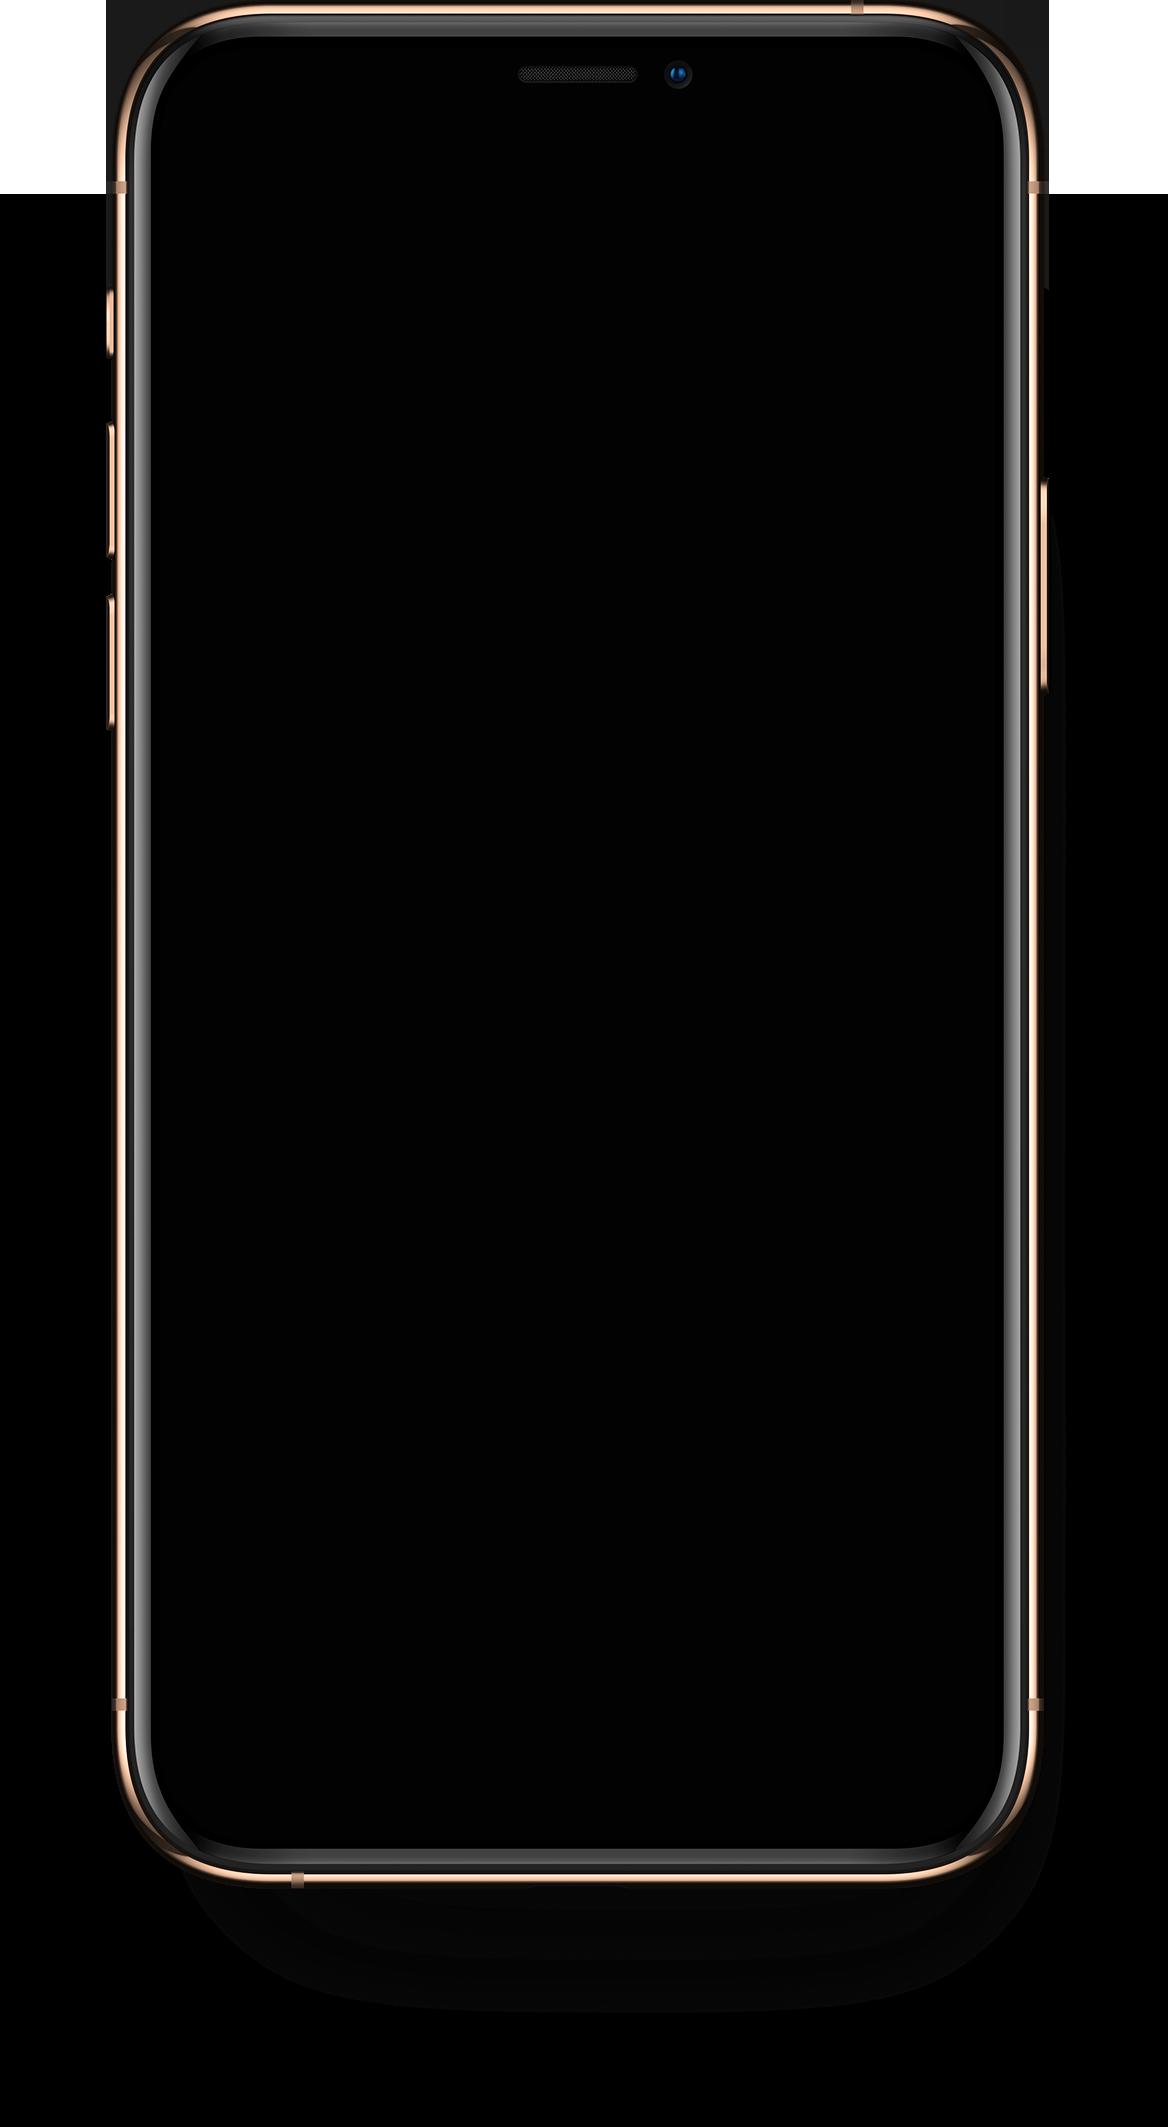 Black IPhone 12 Template IPhone 12 Screen IPhone 12 App Screen Recipes in IPhone 12 Screen Recipes Delivered Order Groceries Online